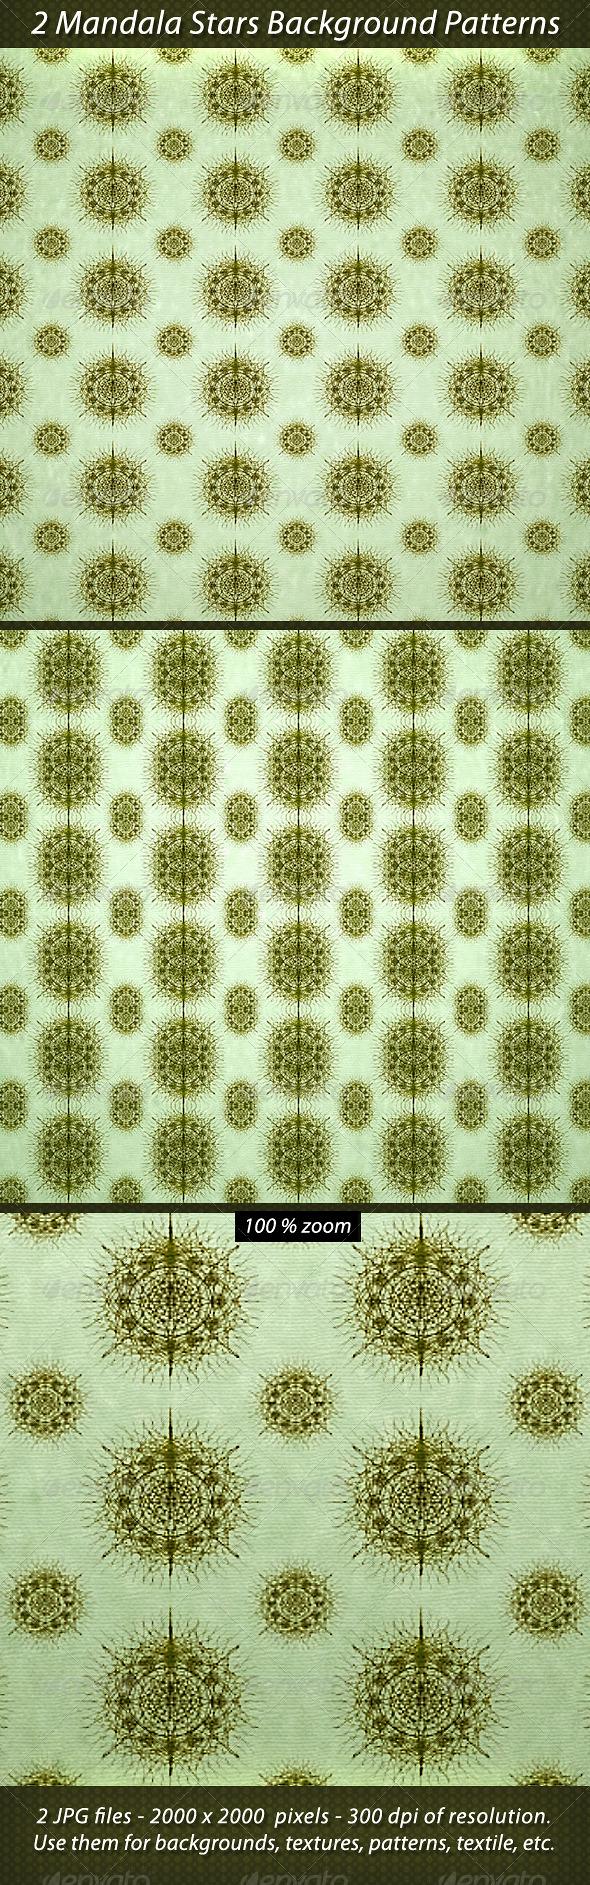 2 Mandala Stars Background Patterns - Patterns Backgrounds